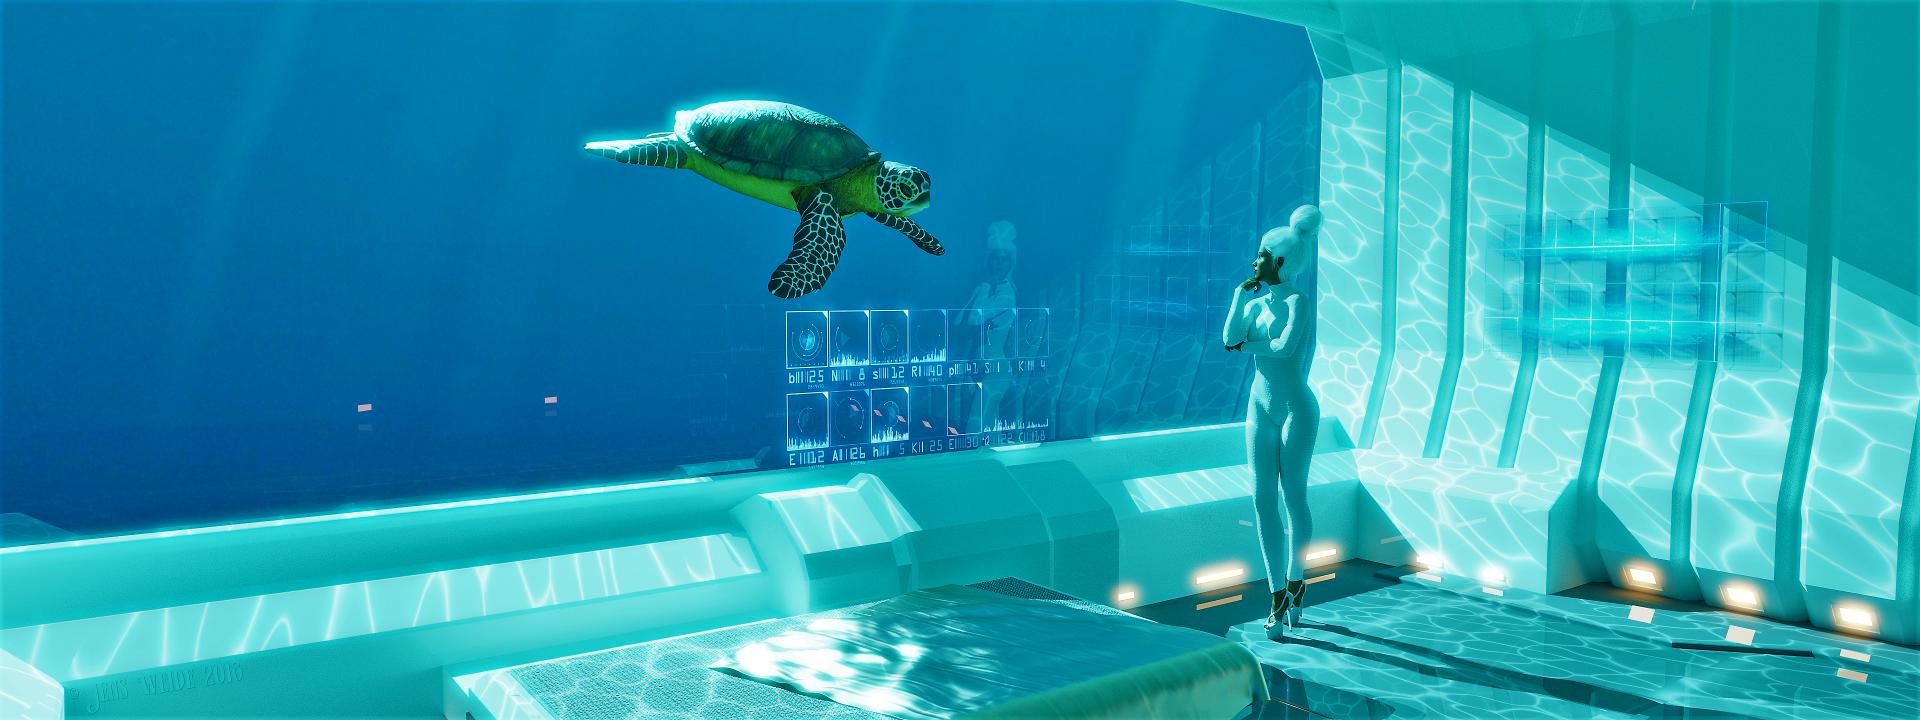 Aquatic 2 by JensDD